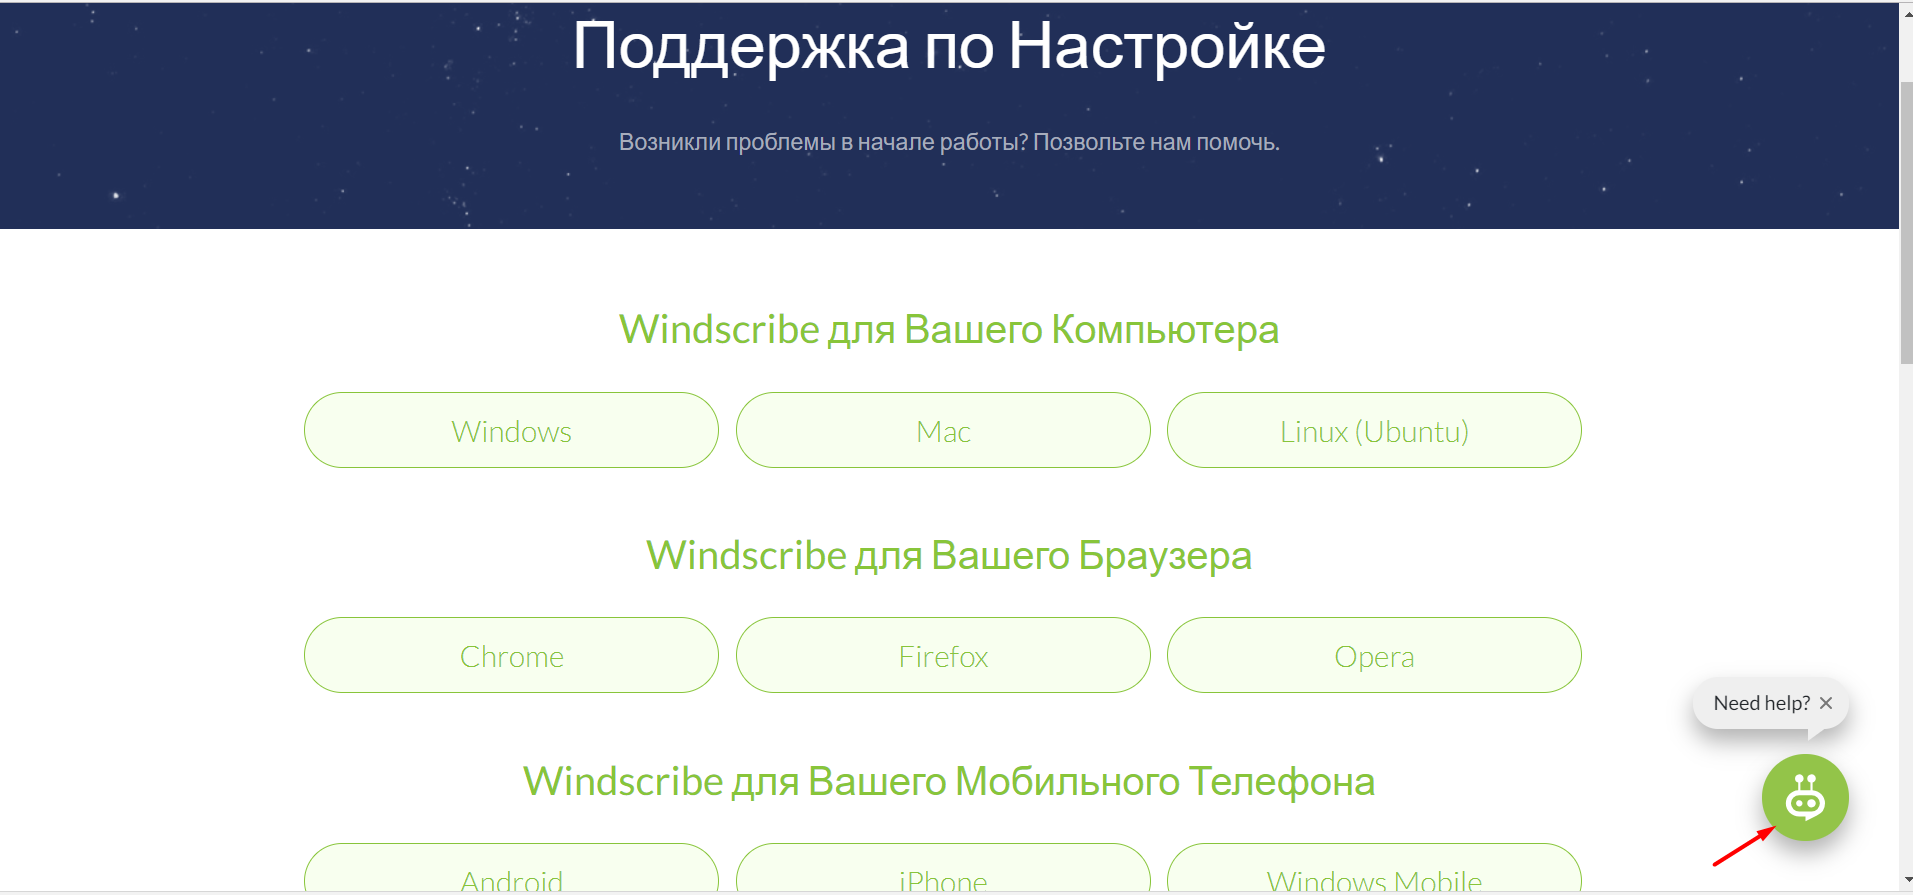 59308f804d7d На заметку  Windscribe совместима с такими ОС как Windows, iOS, Android,  Mac, Linux, а также присутствуют плагины для Firefox, Chrome и Opera.